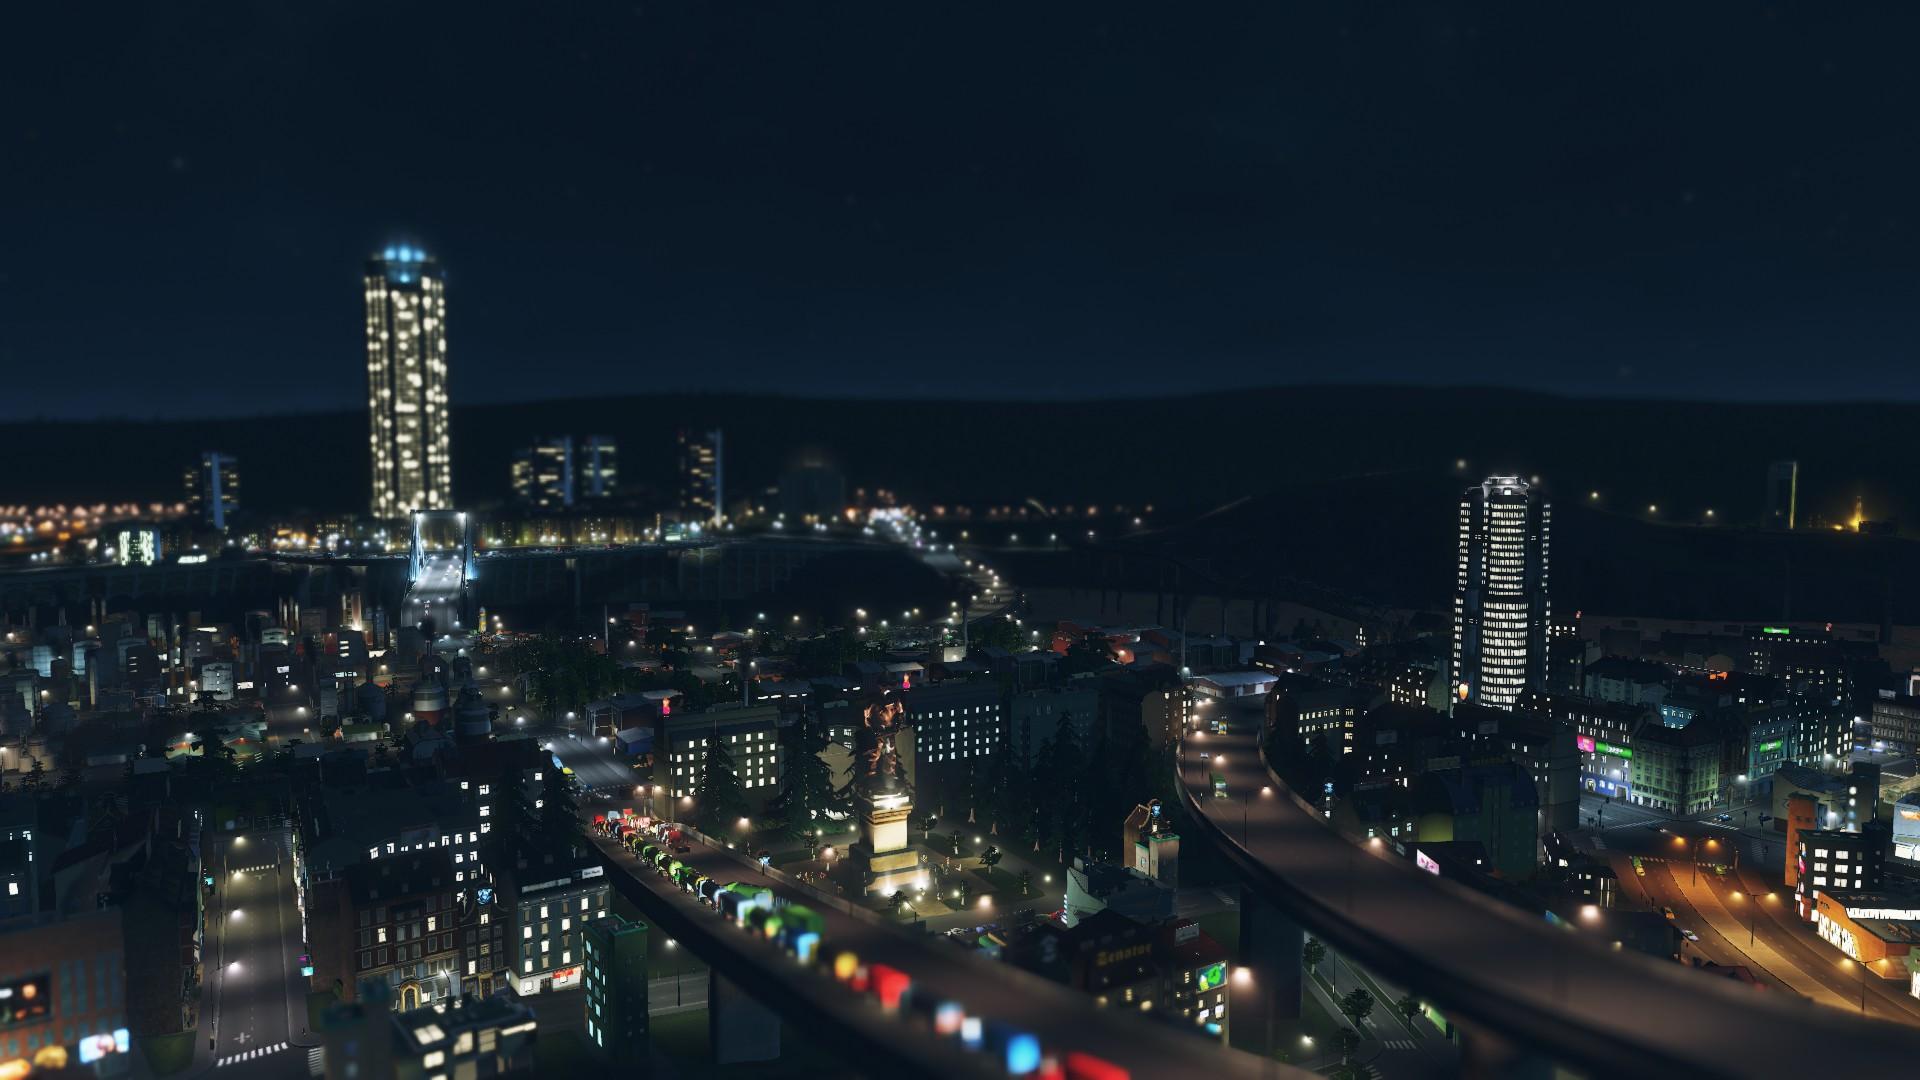 20171107221550_1.jpg - Cities: Skylines